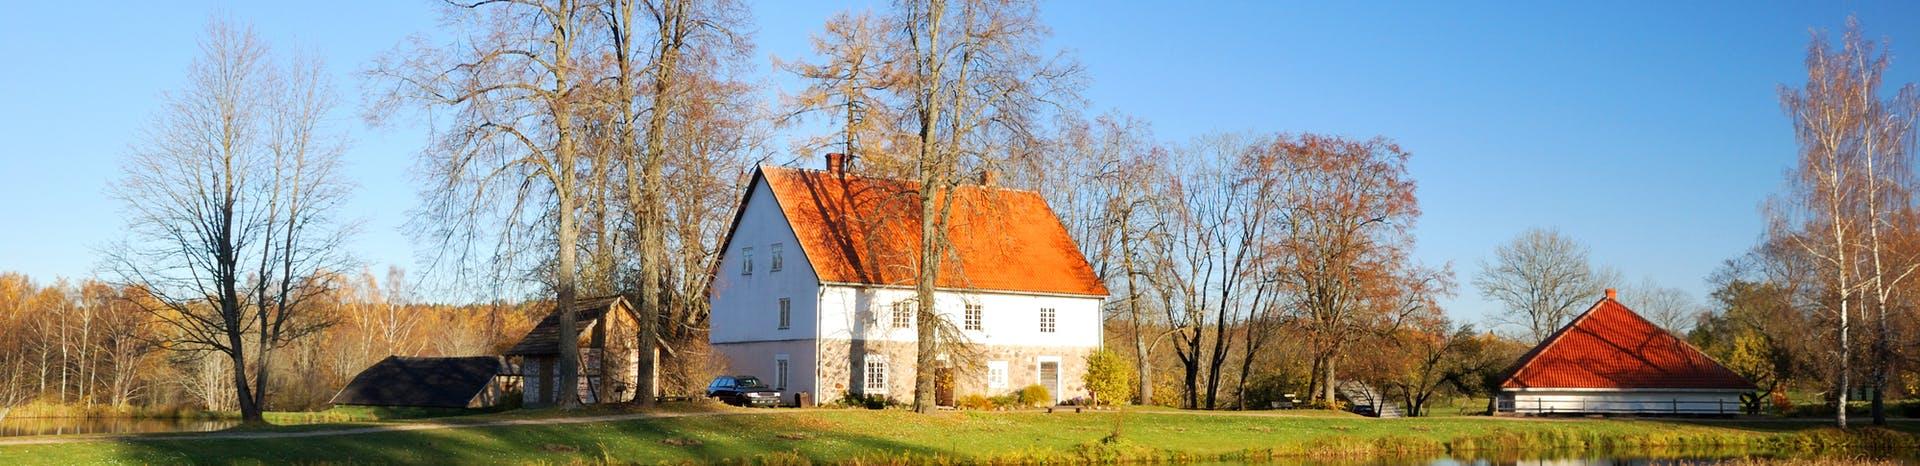 Picture of Sigulda